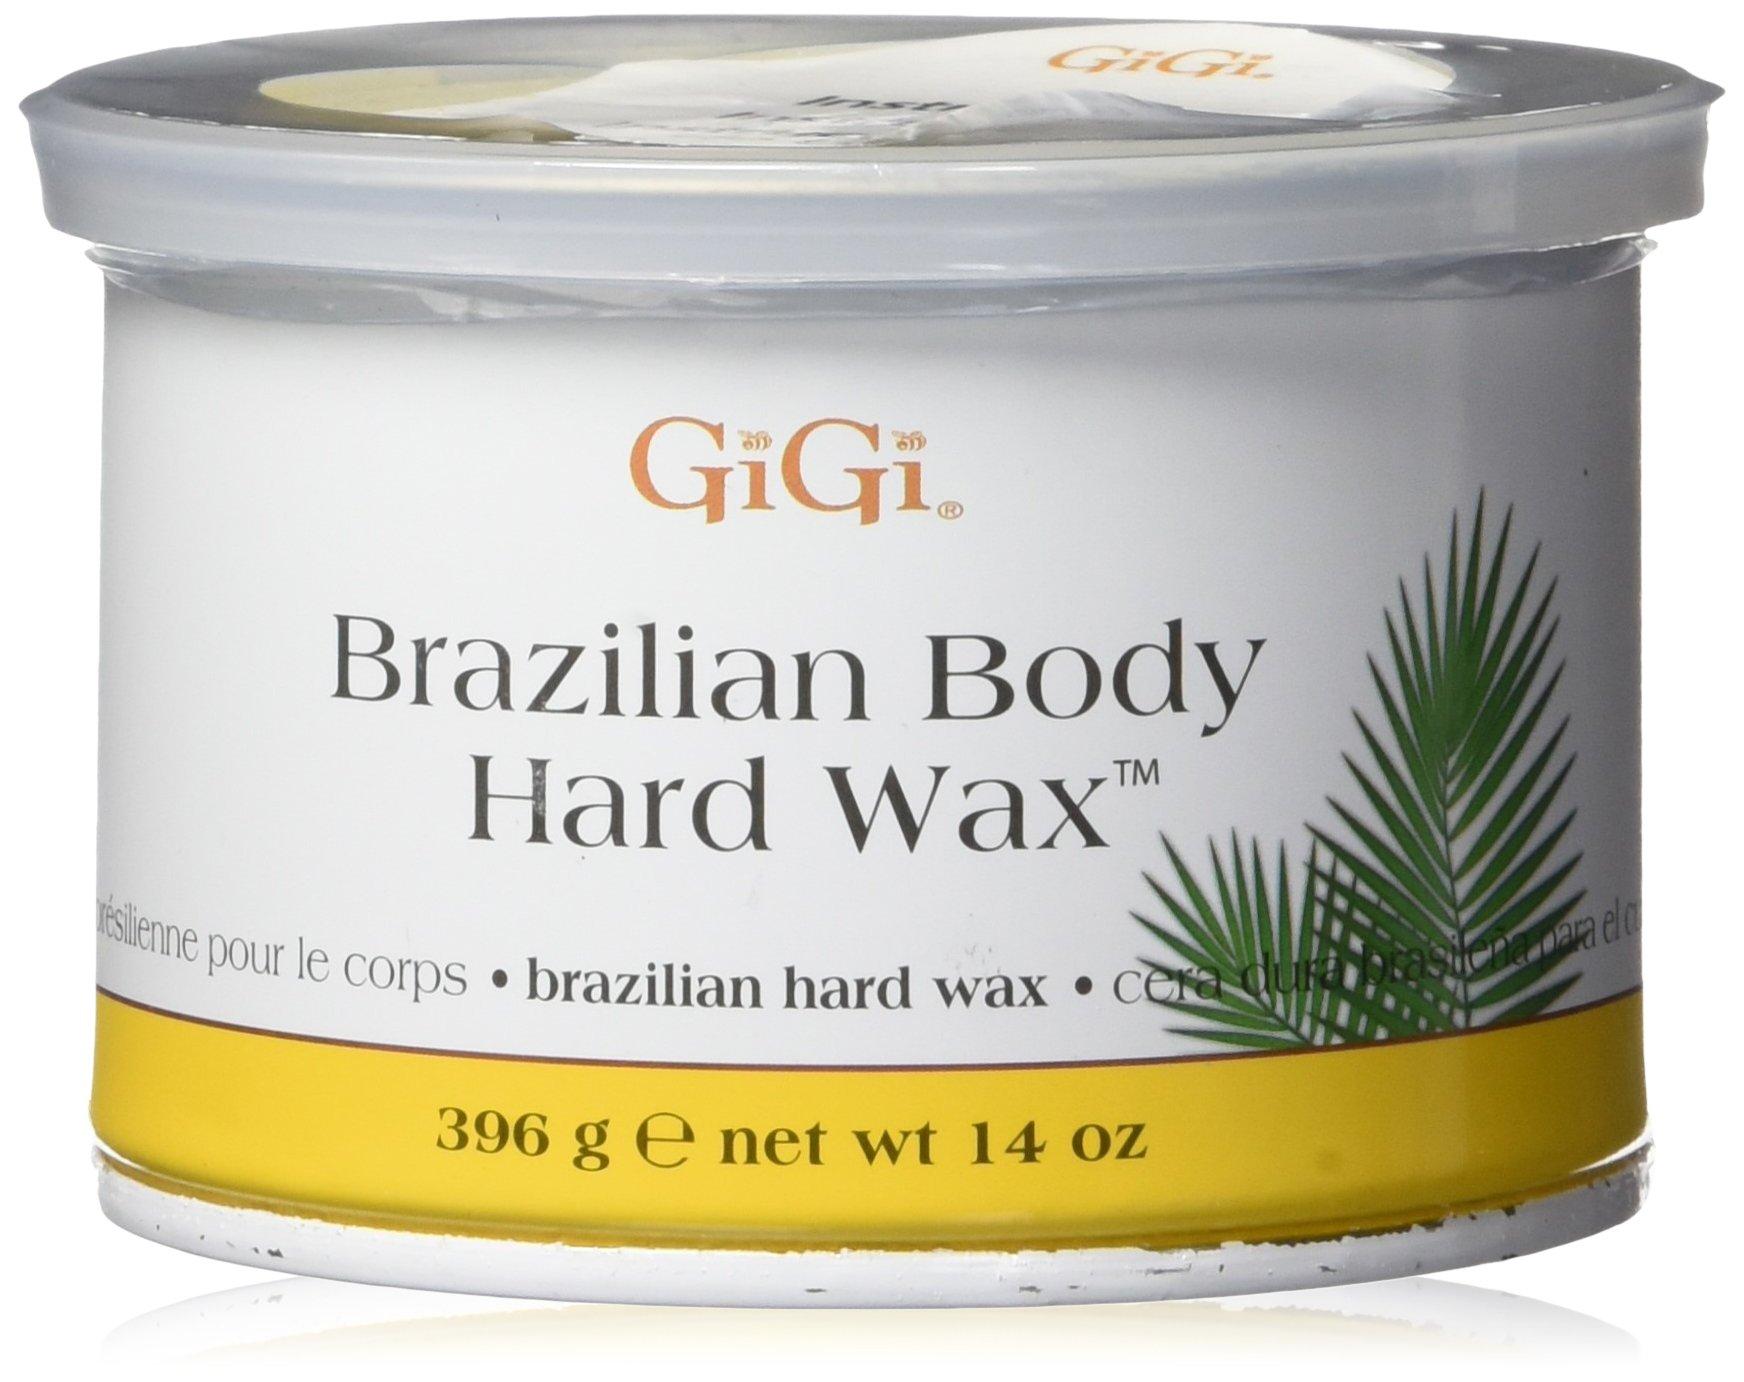 Gigi Hard Body Wax for Brazilian Sensitive Areas, 18 oz by GiGi (Image #1)